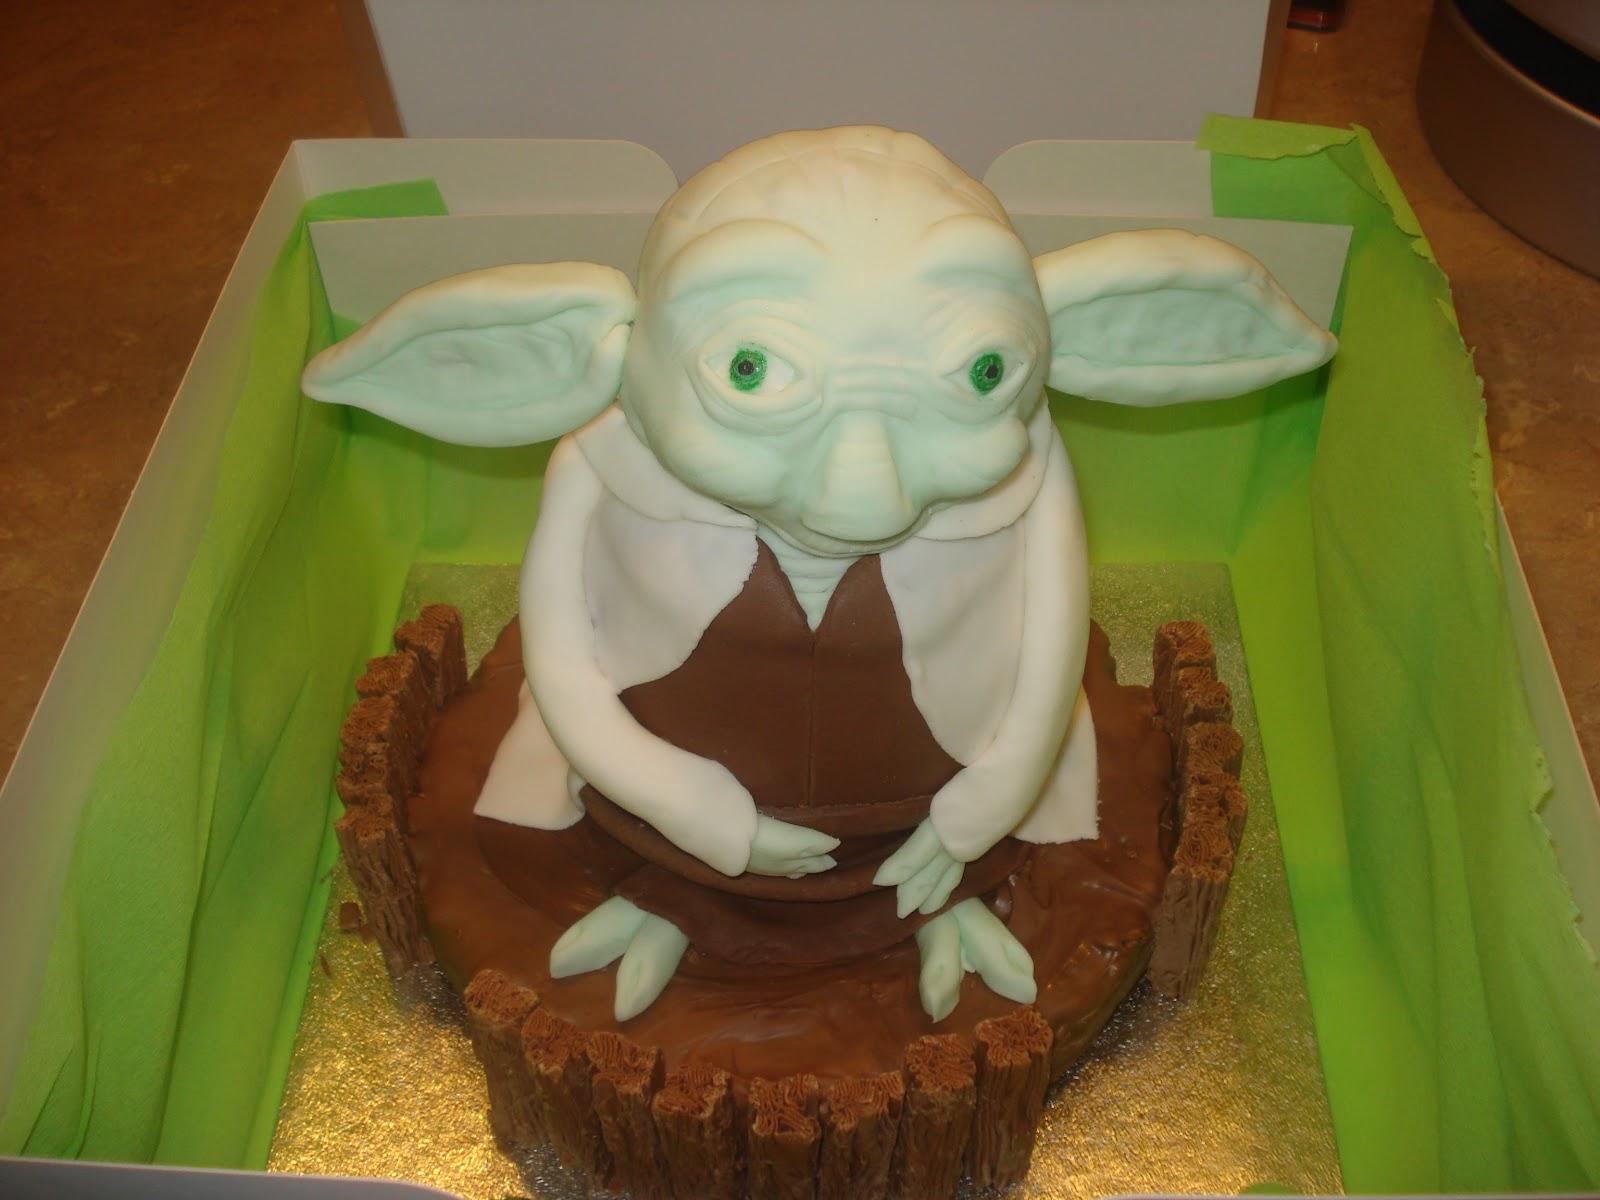 How To Make An Easy Yoda Cake